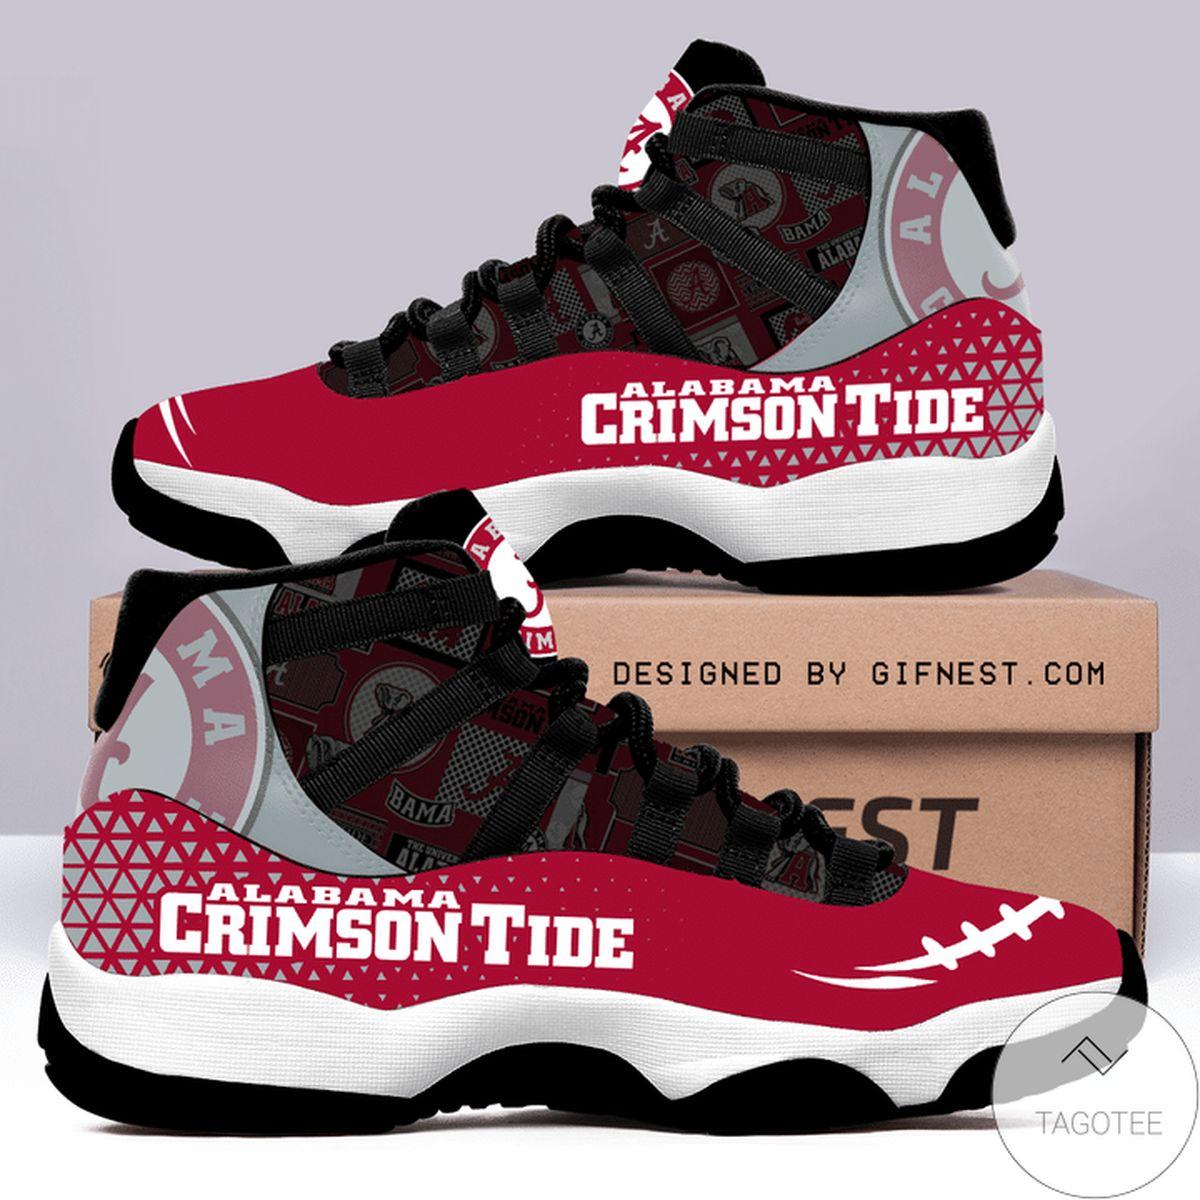 Alabama Crimson Tide Air Jordan 11 Shoes